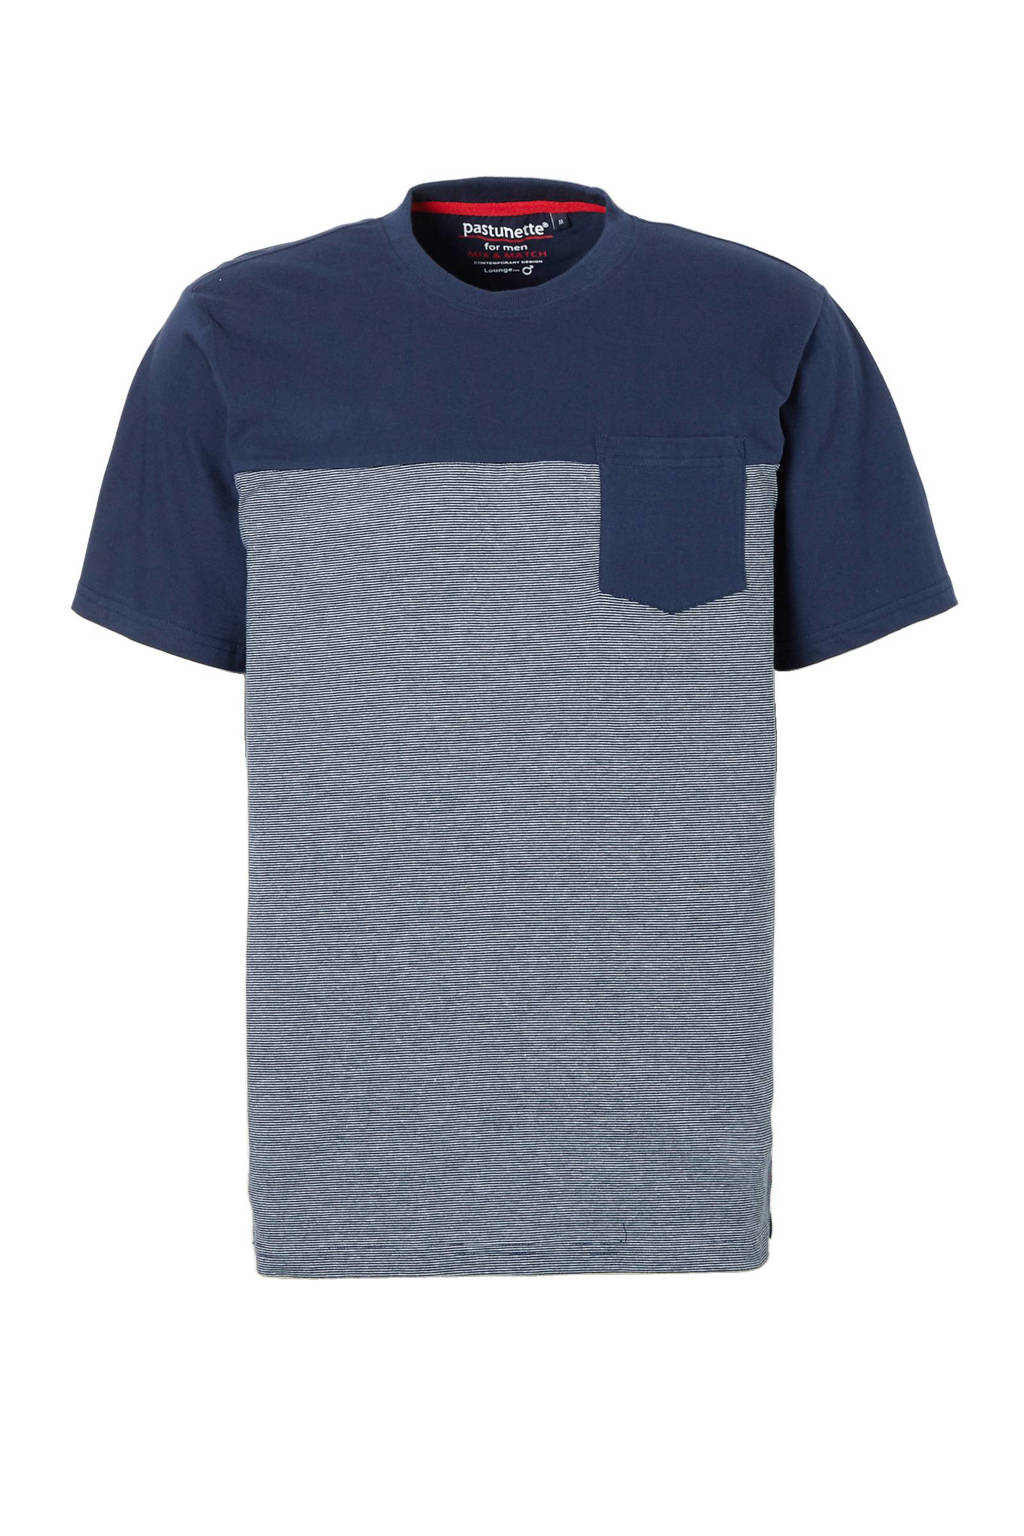 Pastunette for men pyjamatop, Marine/wit